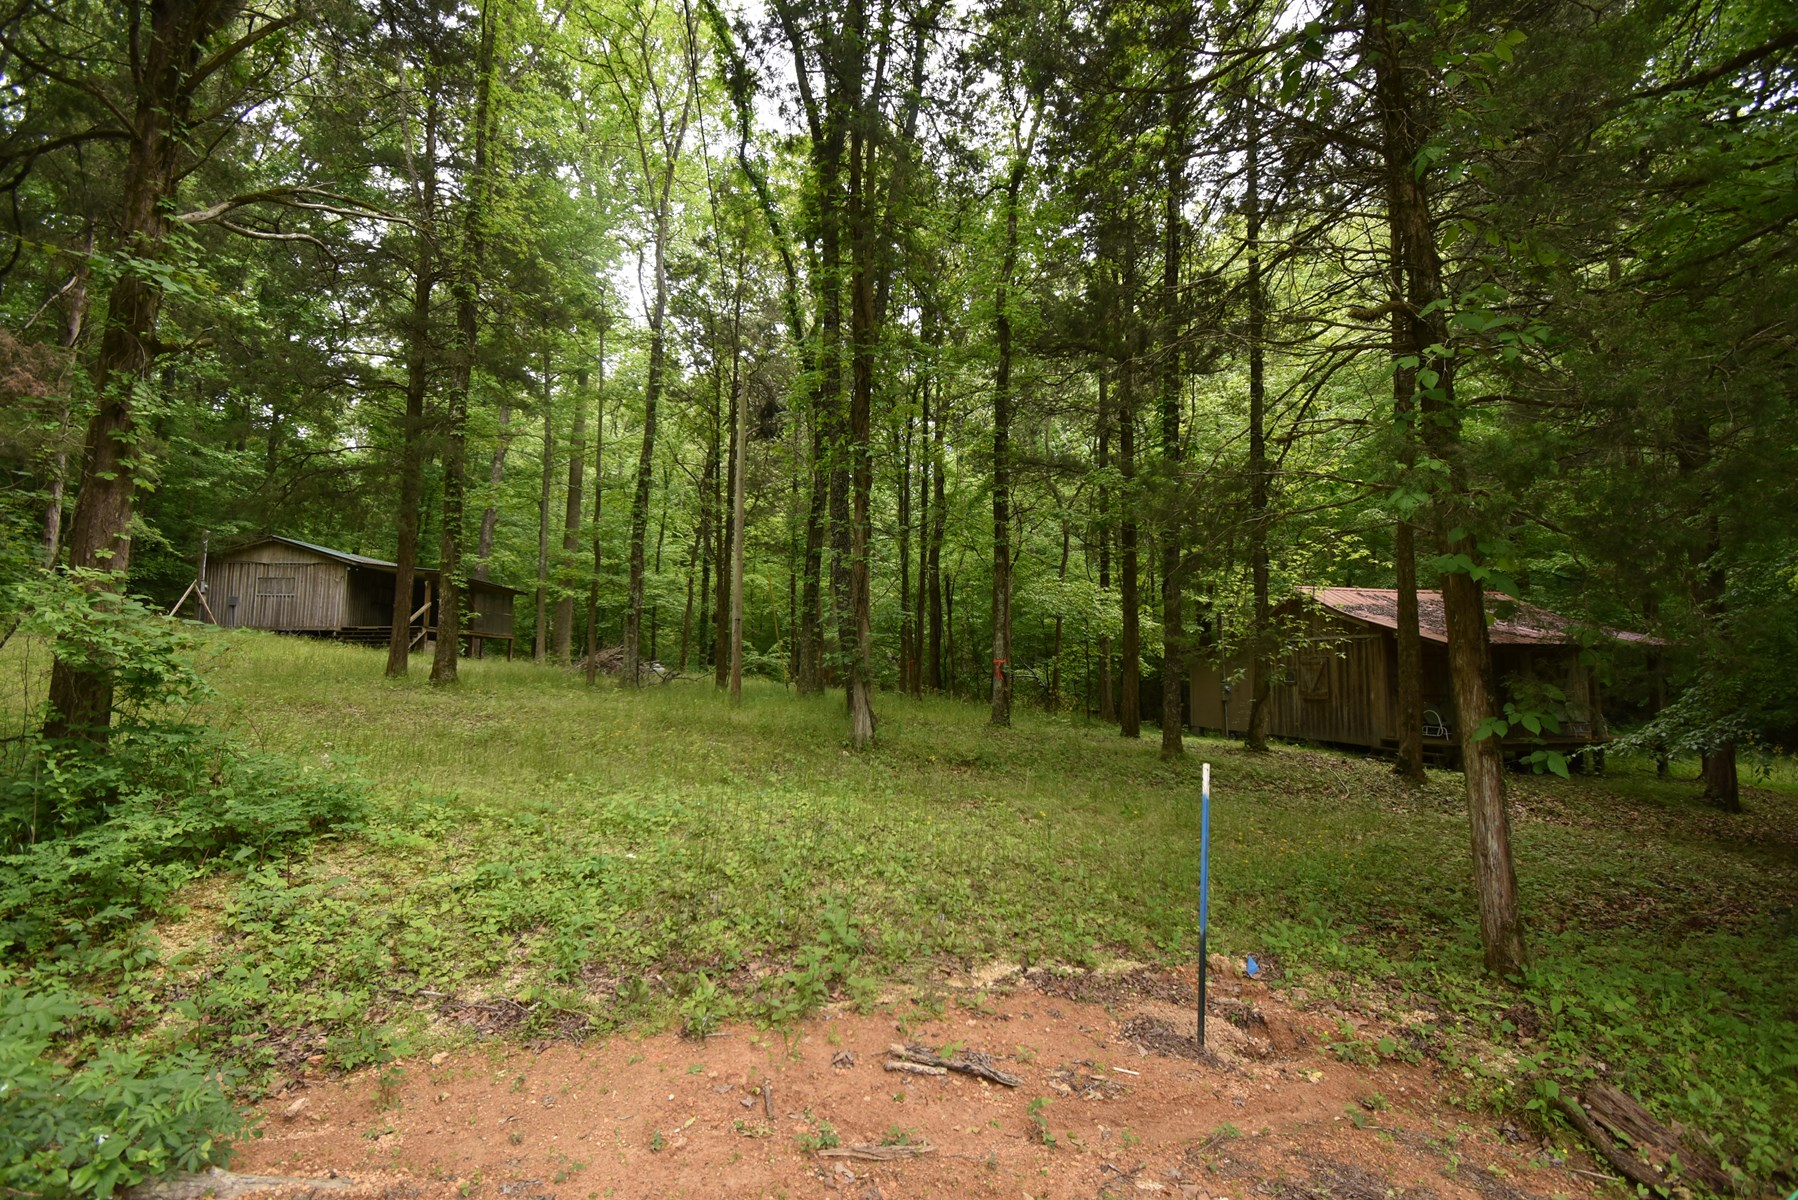 Two Cabins near the Buffalo River located in Wayne County TN